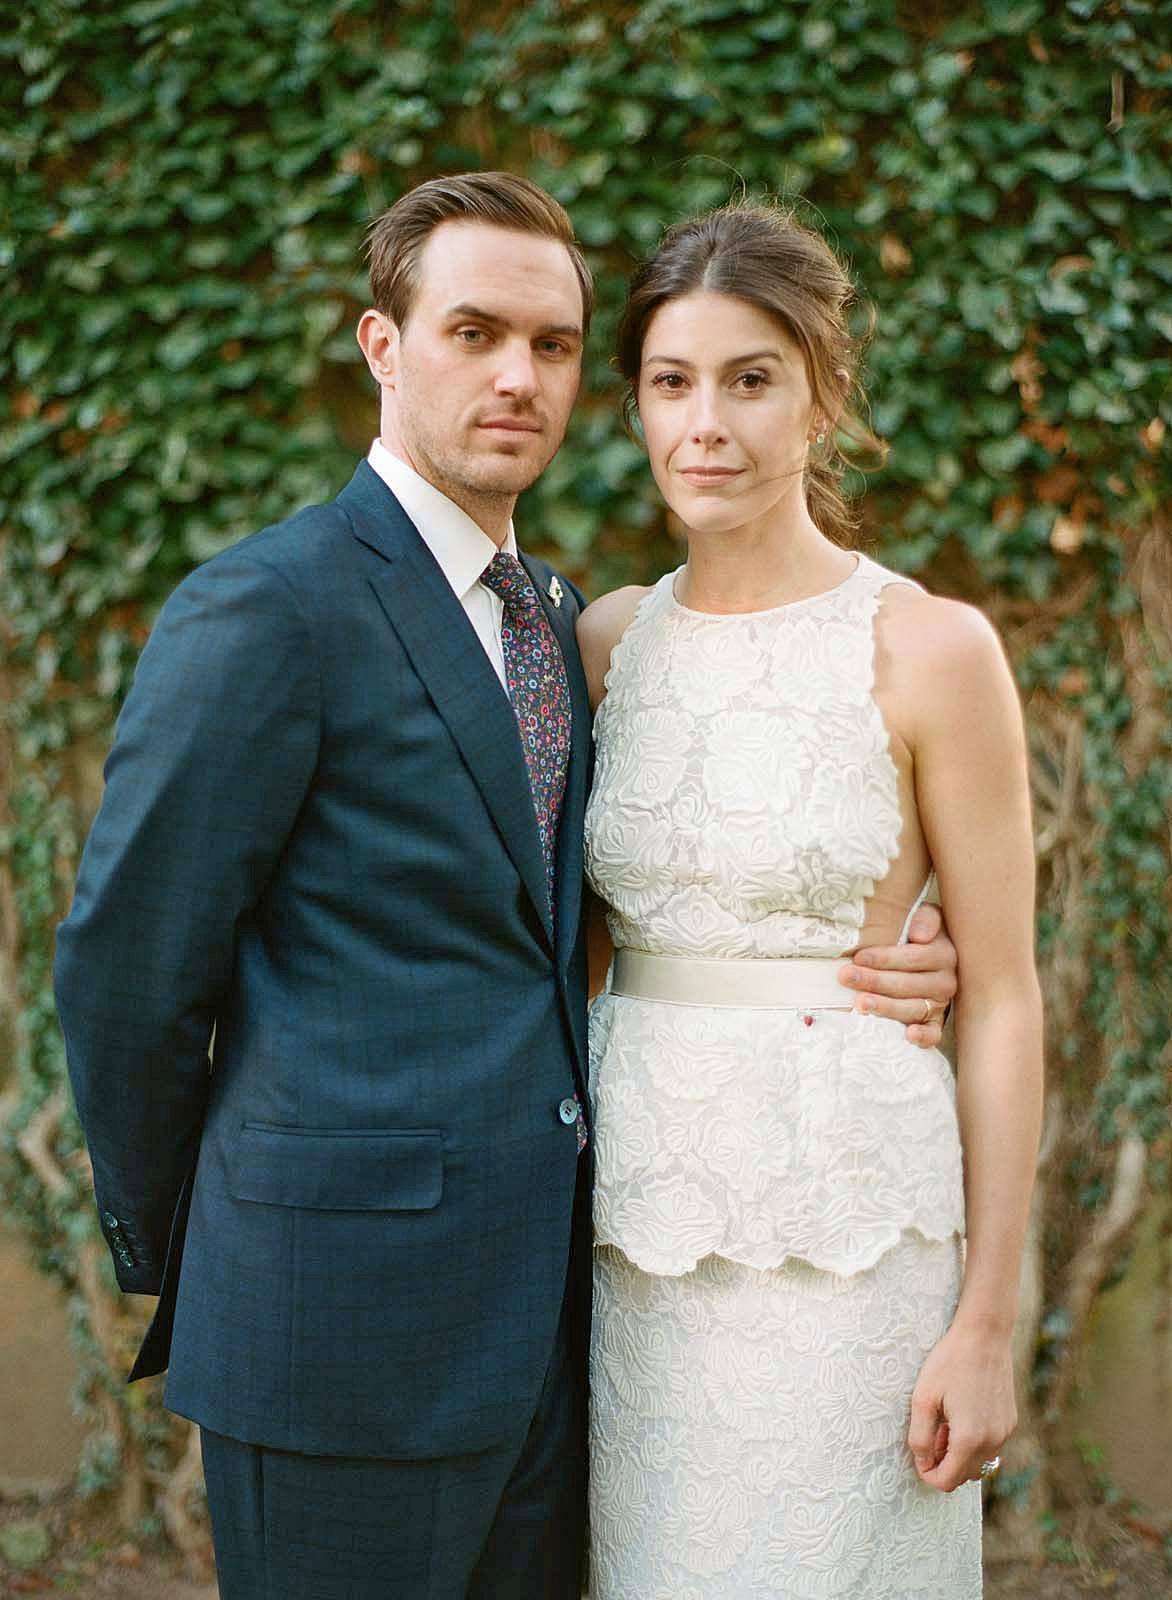 meg nick wedding couple formal